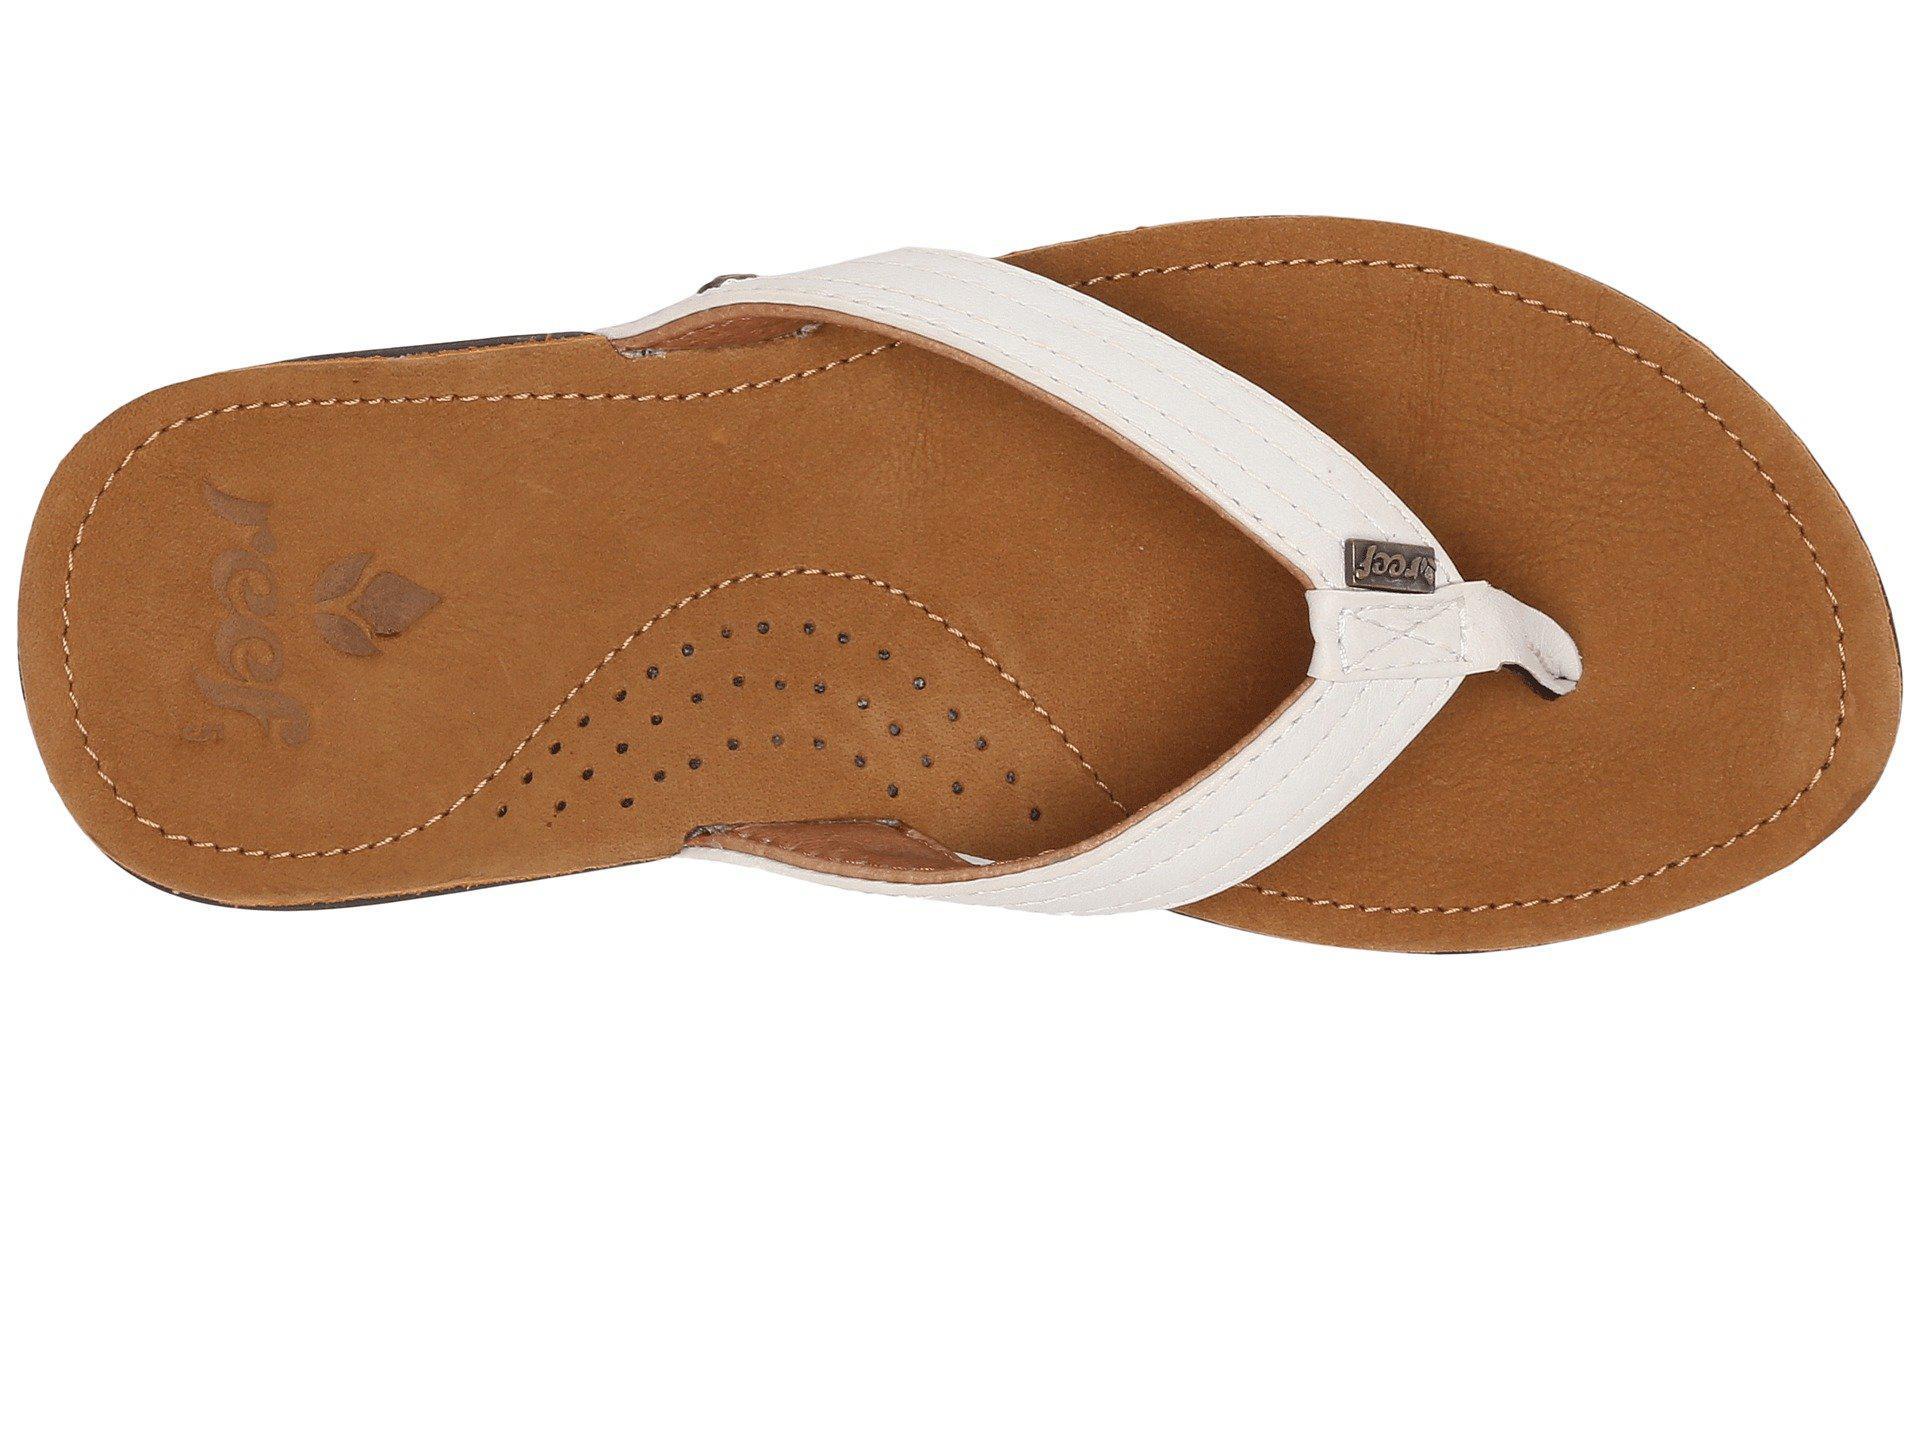 0c6d25ff09005 Reef - Brown Miss J-bay (tan white) Women s Sandals - Lyst. View fullscreen